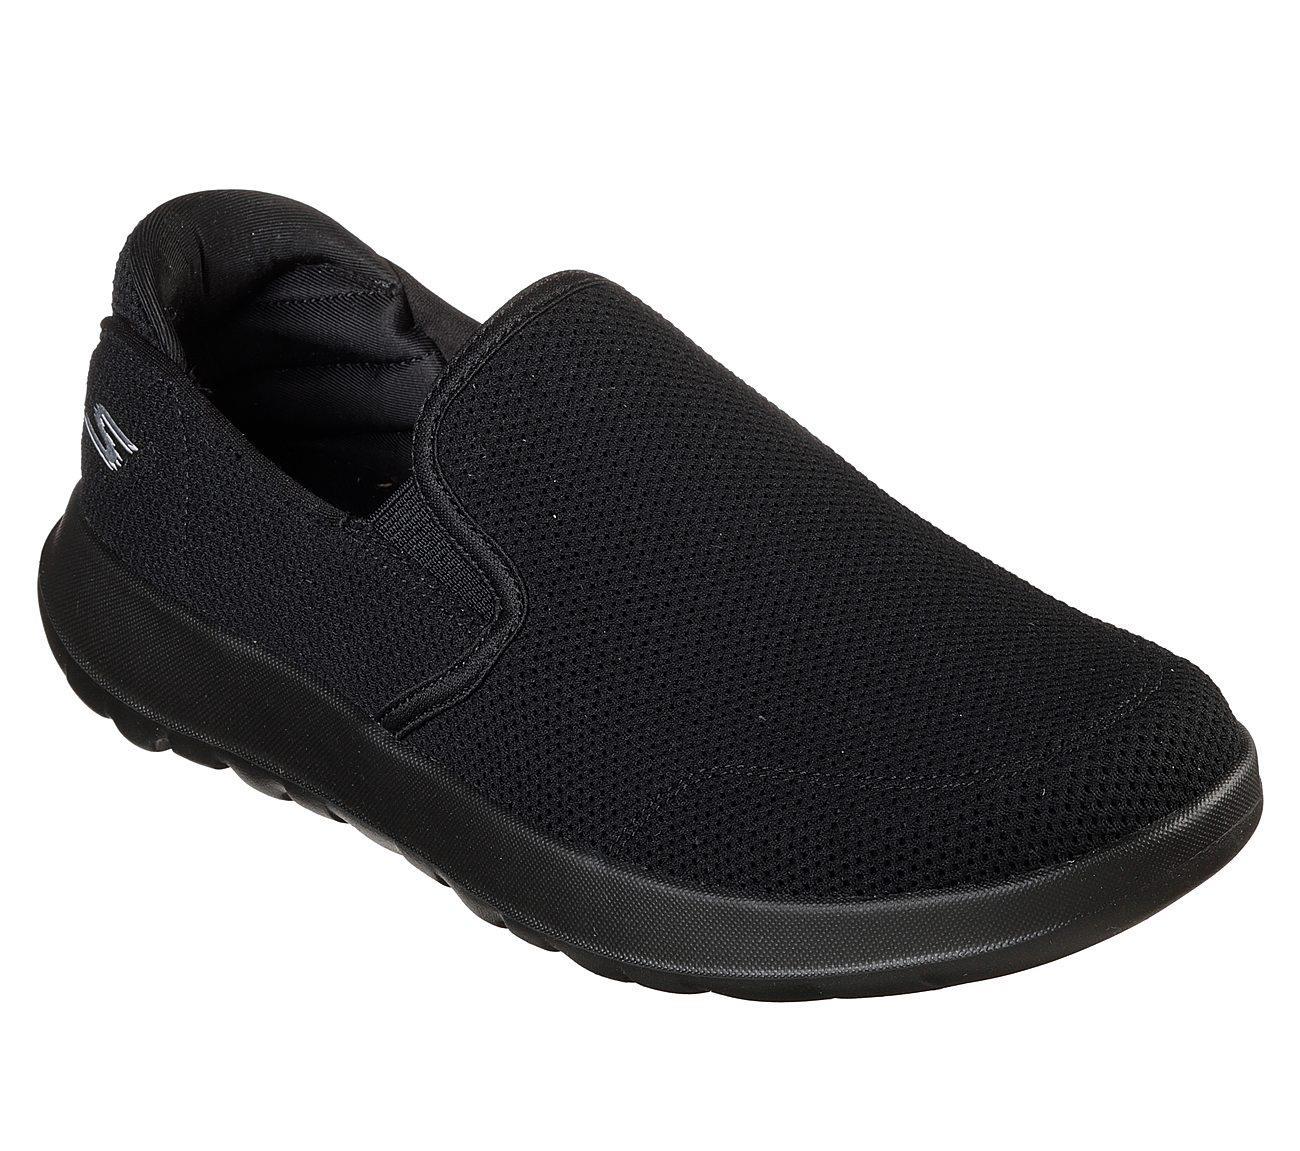 Skechers Adapt Ultra - Leisure Erkek Ayakkabı Siyah SKC55399 BBK